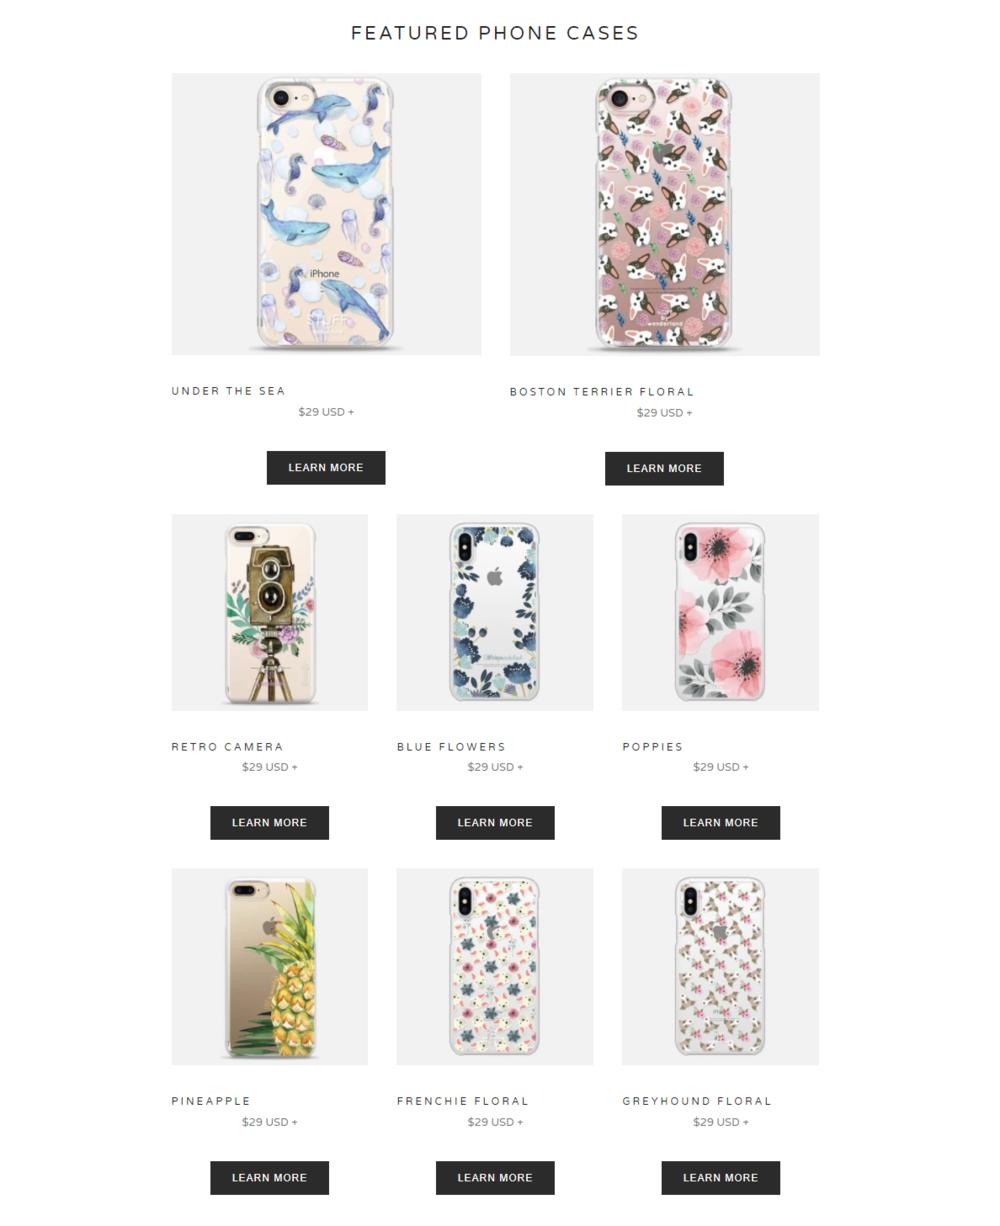 phone cases by stuffxwonderland for casetify on ashleyfisher.ca